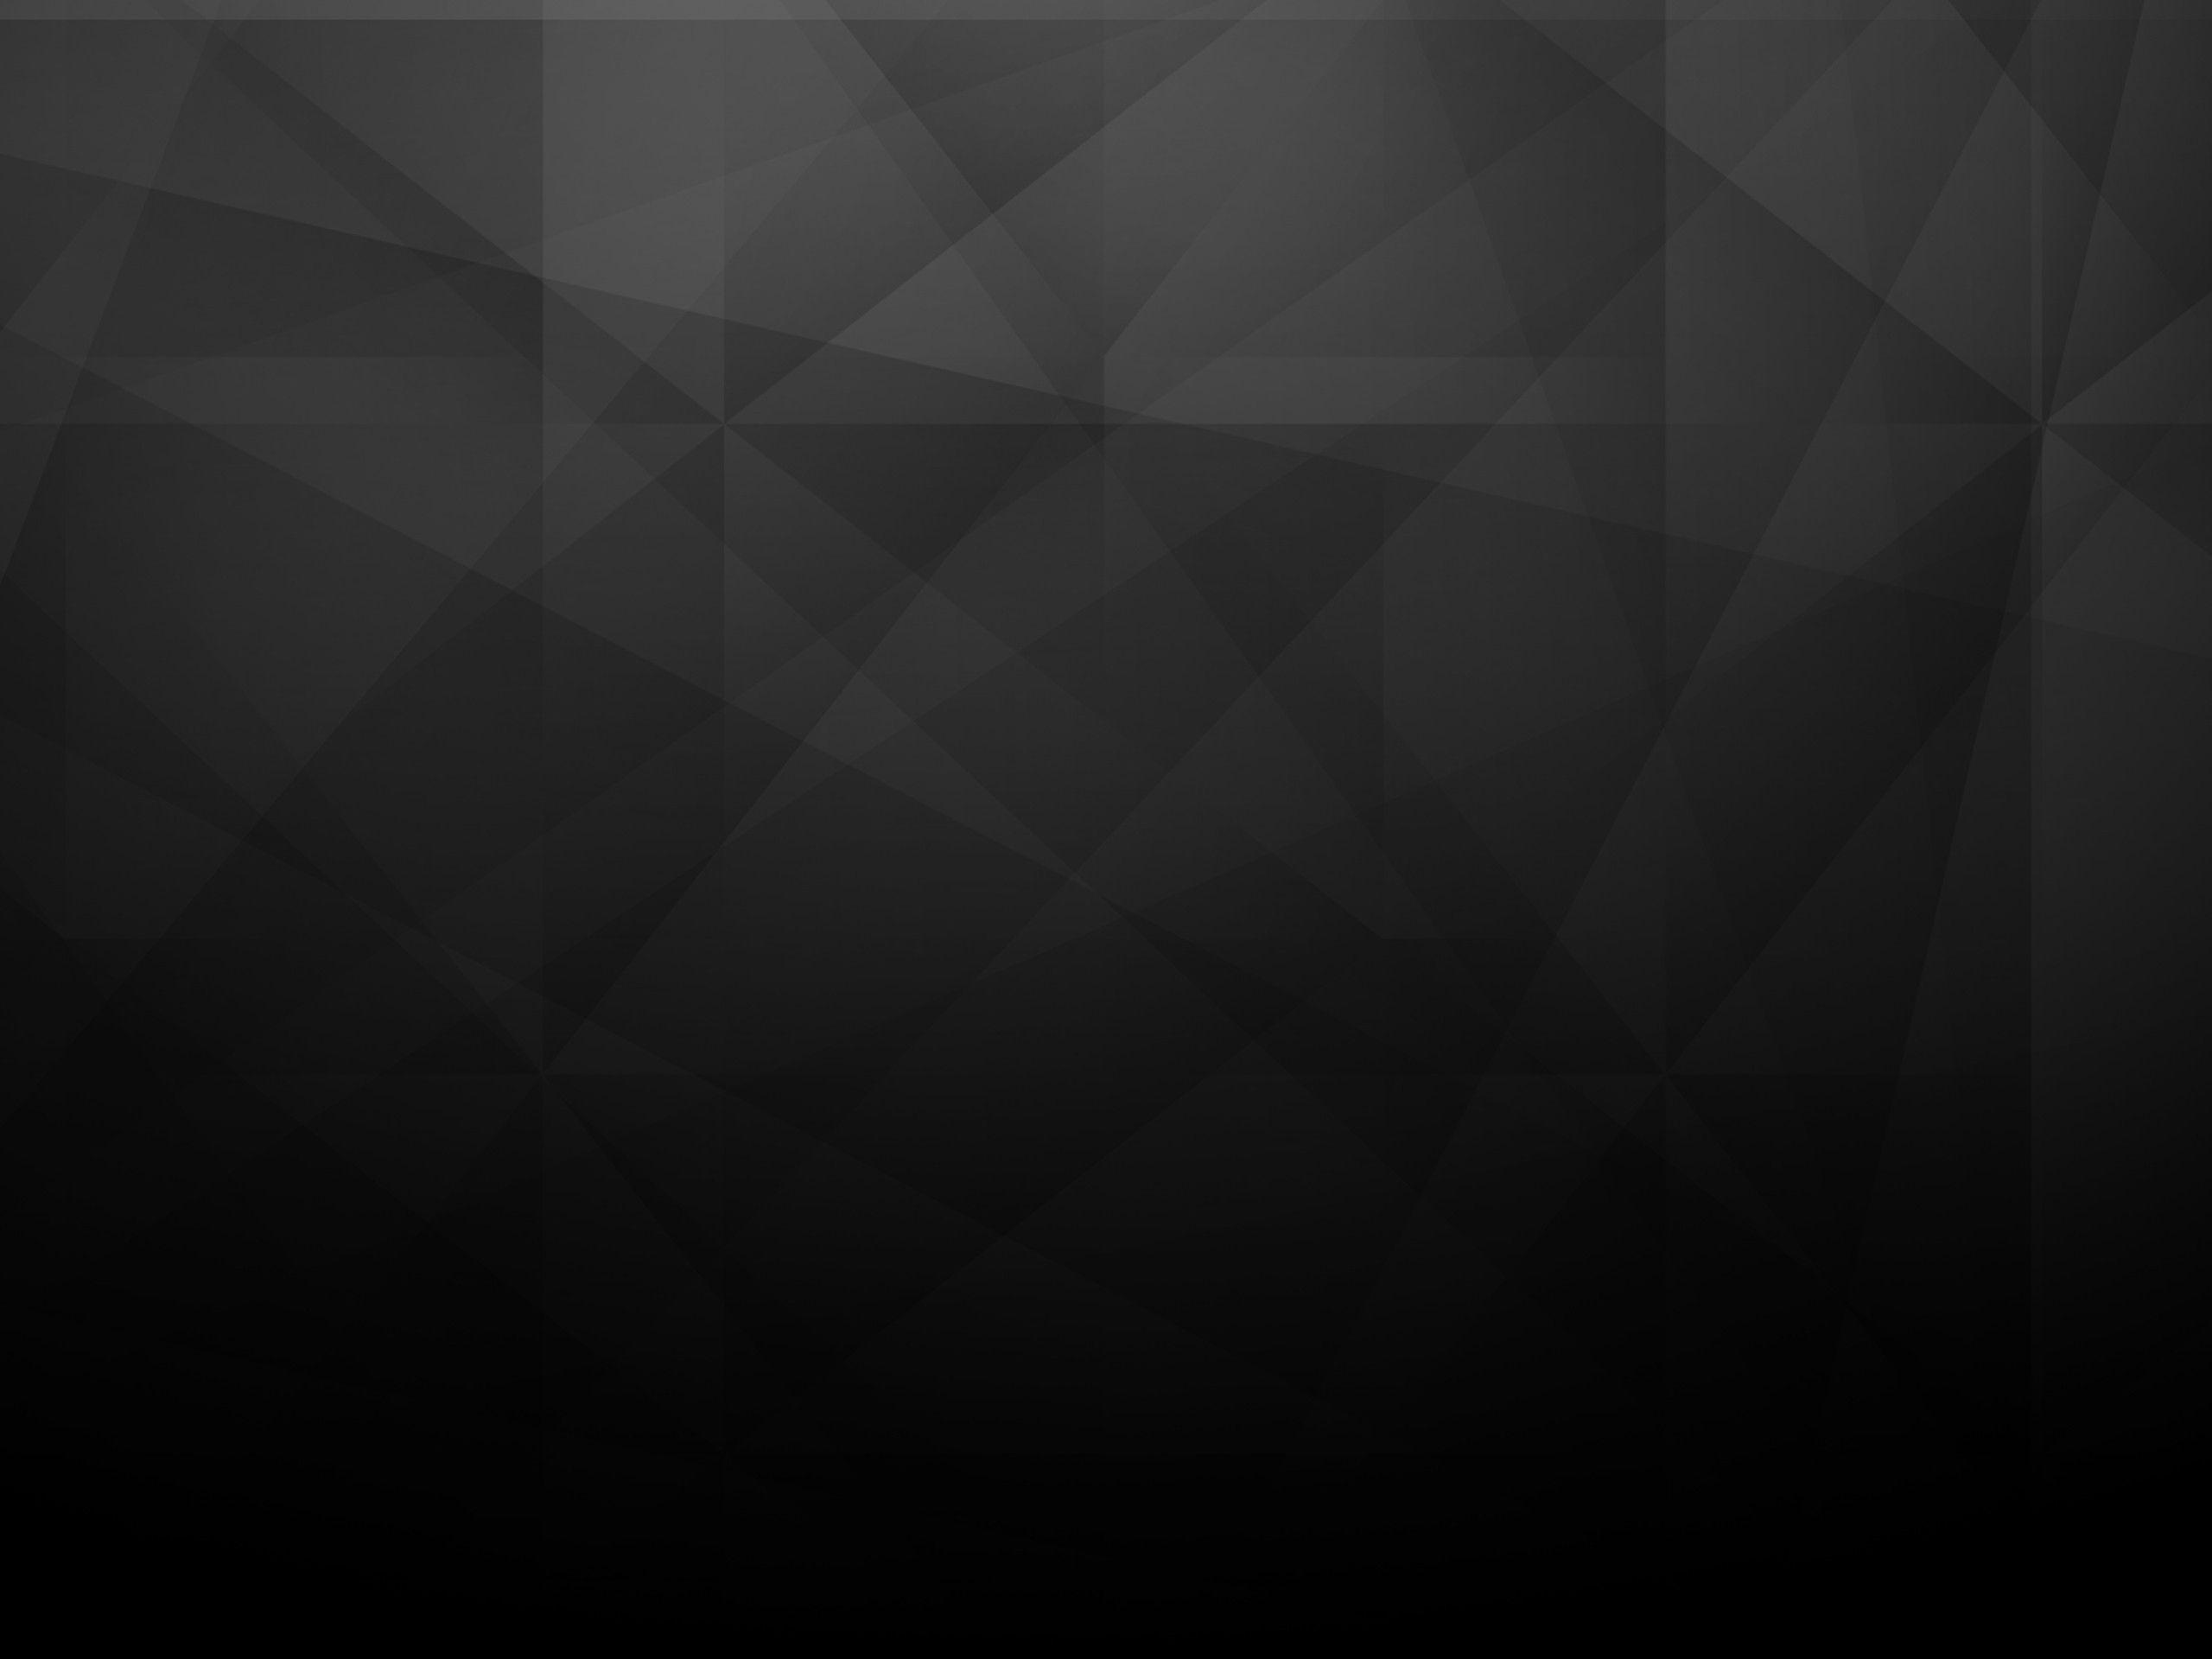 Black Elegant Wallpapers Wallpaper Black Hd Wallpaper Dark Black Wallpaper Black Background Design